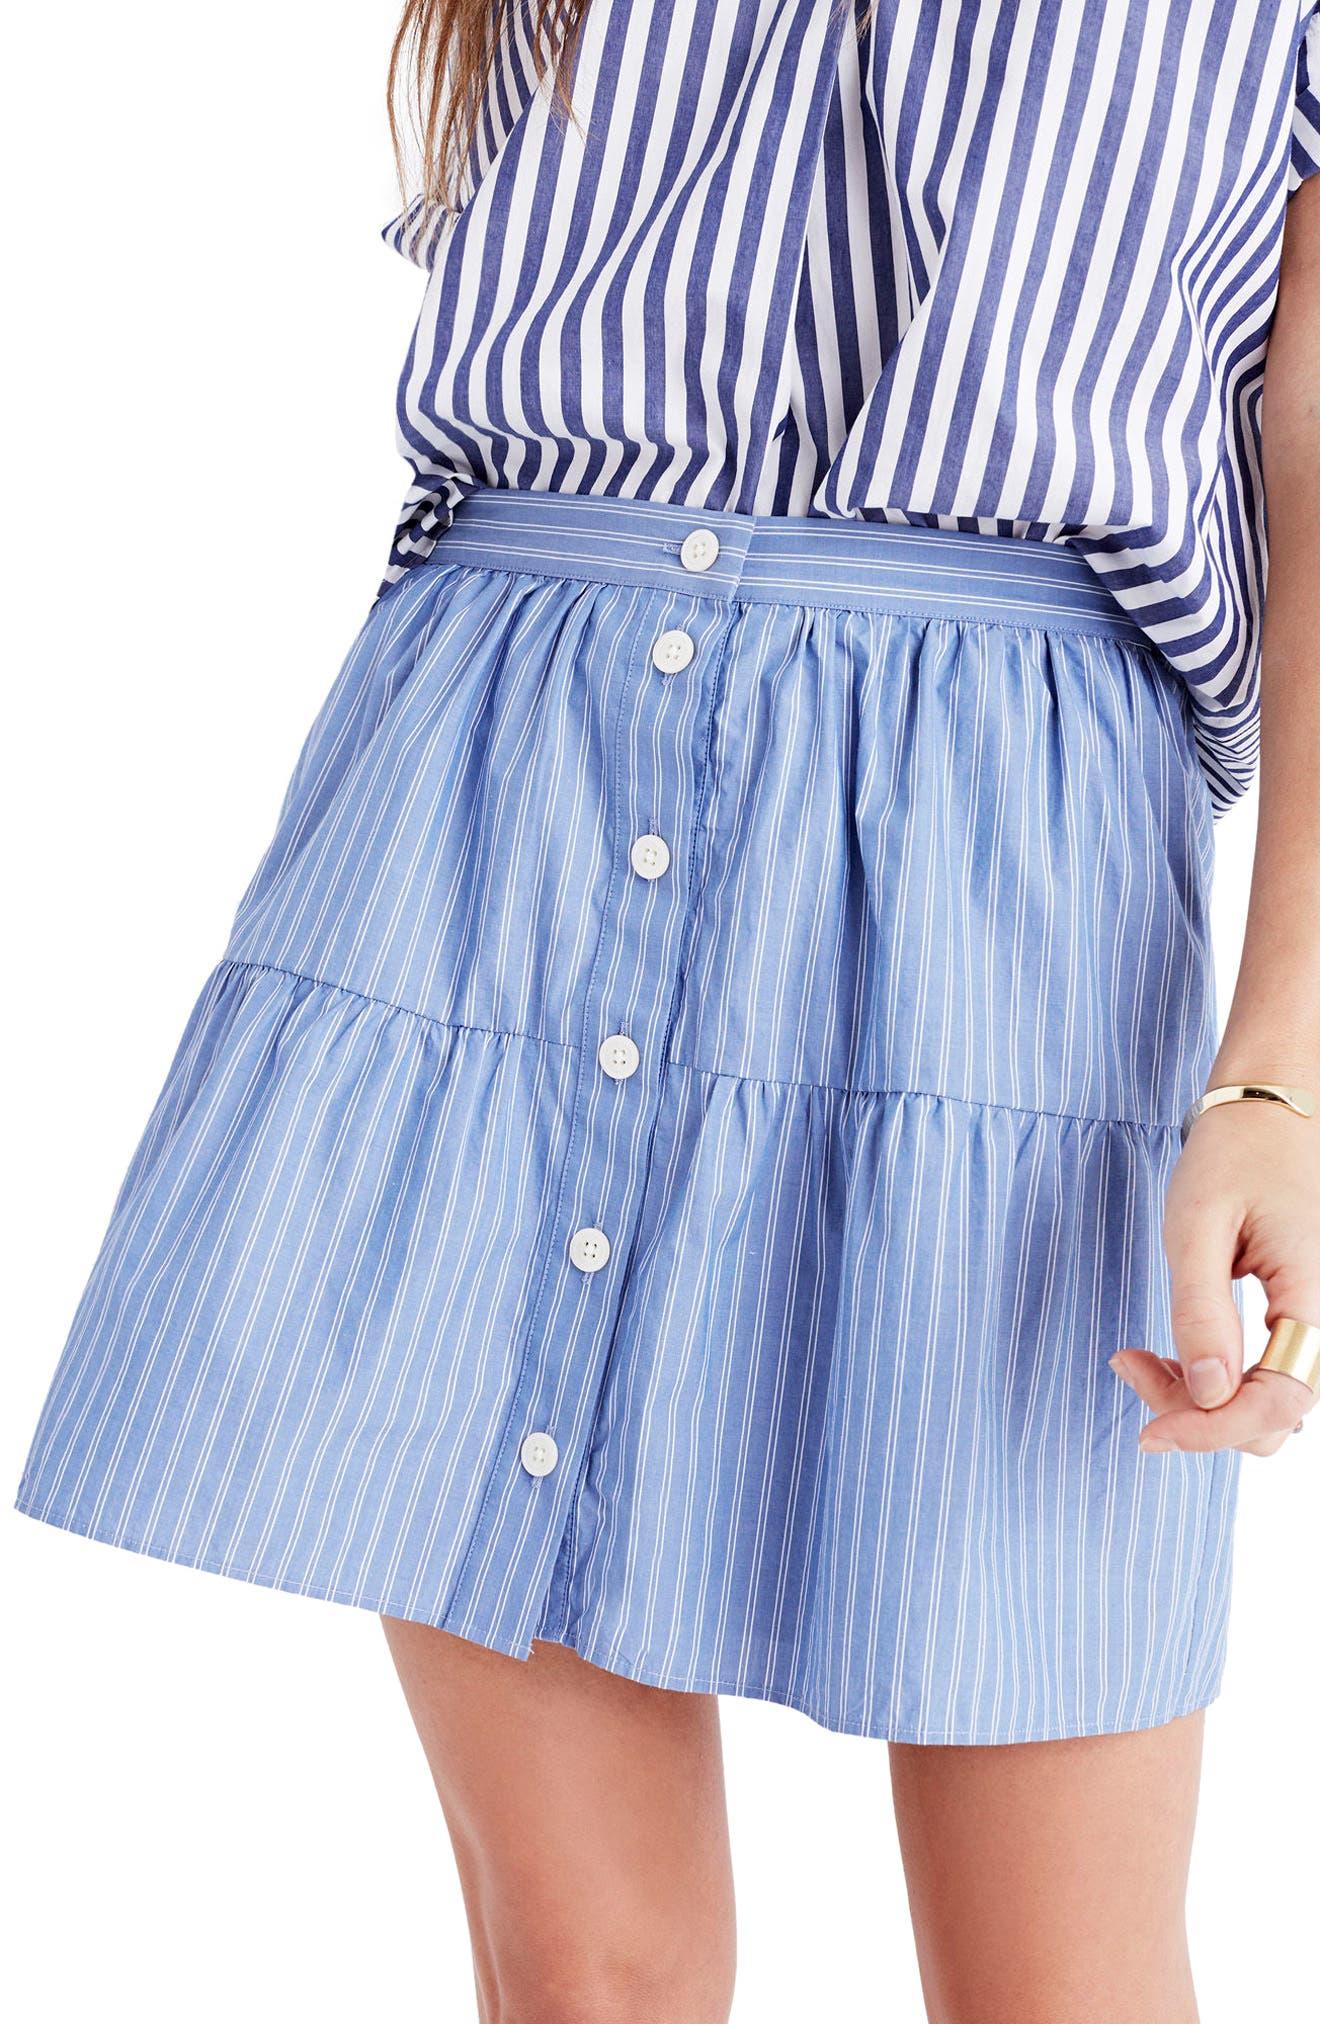 Madewell Bistro Stripe Skirt